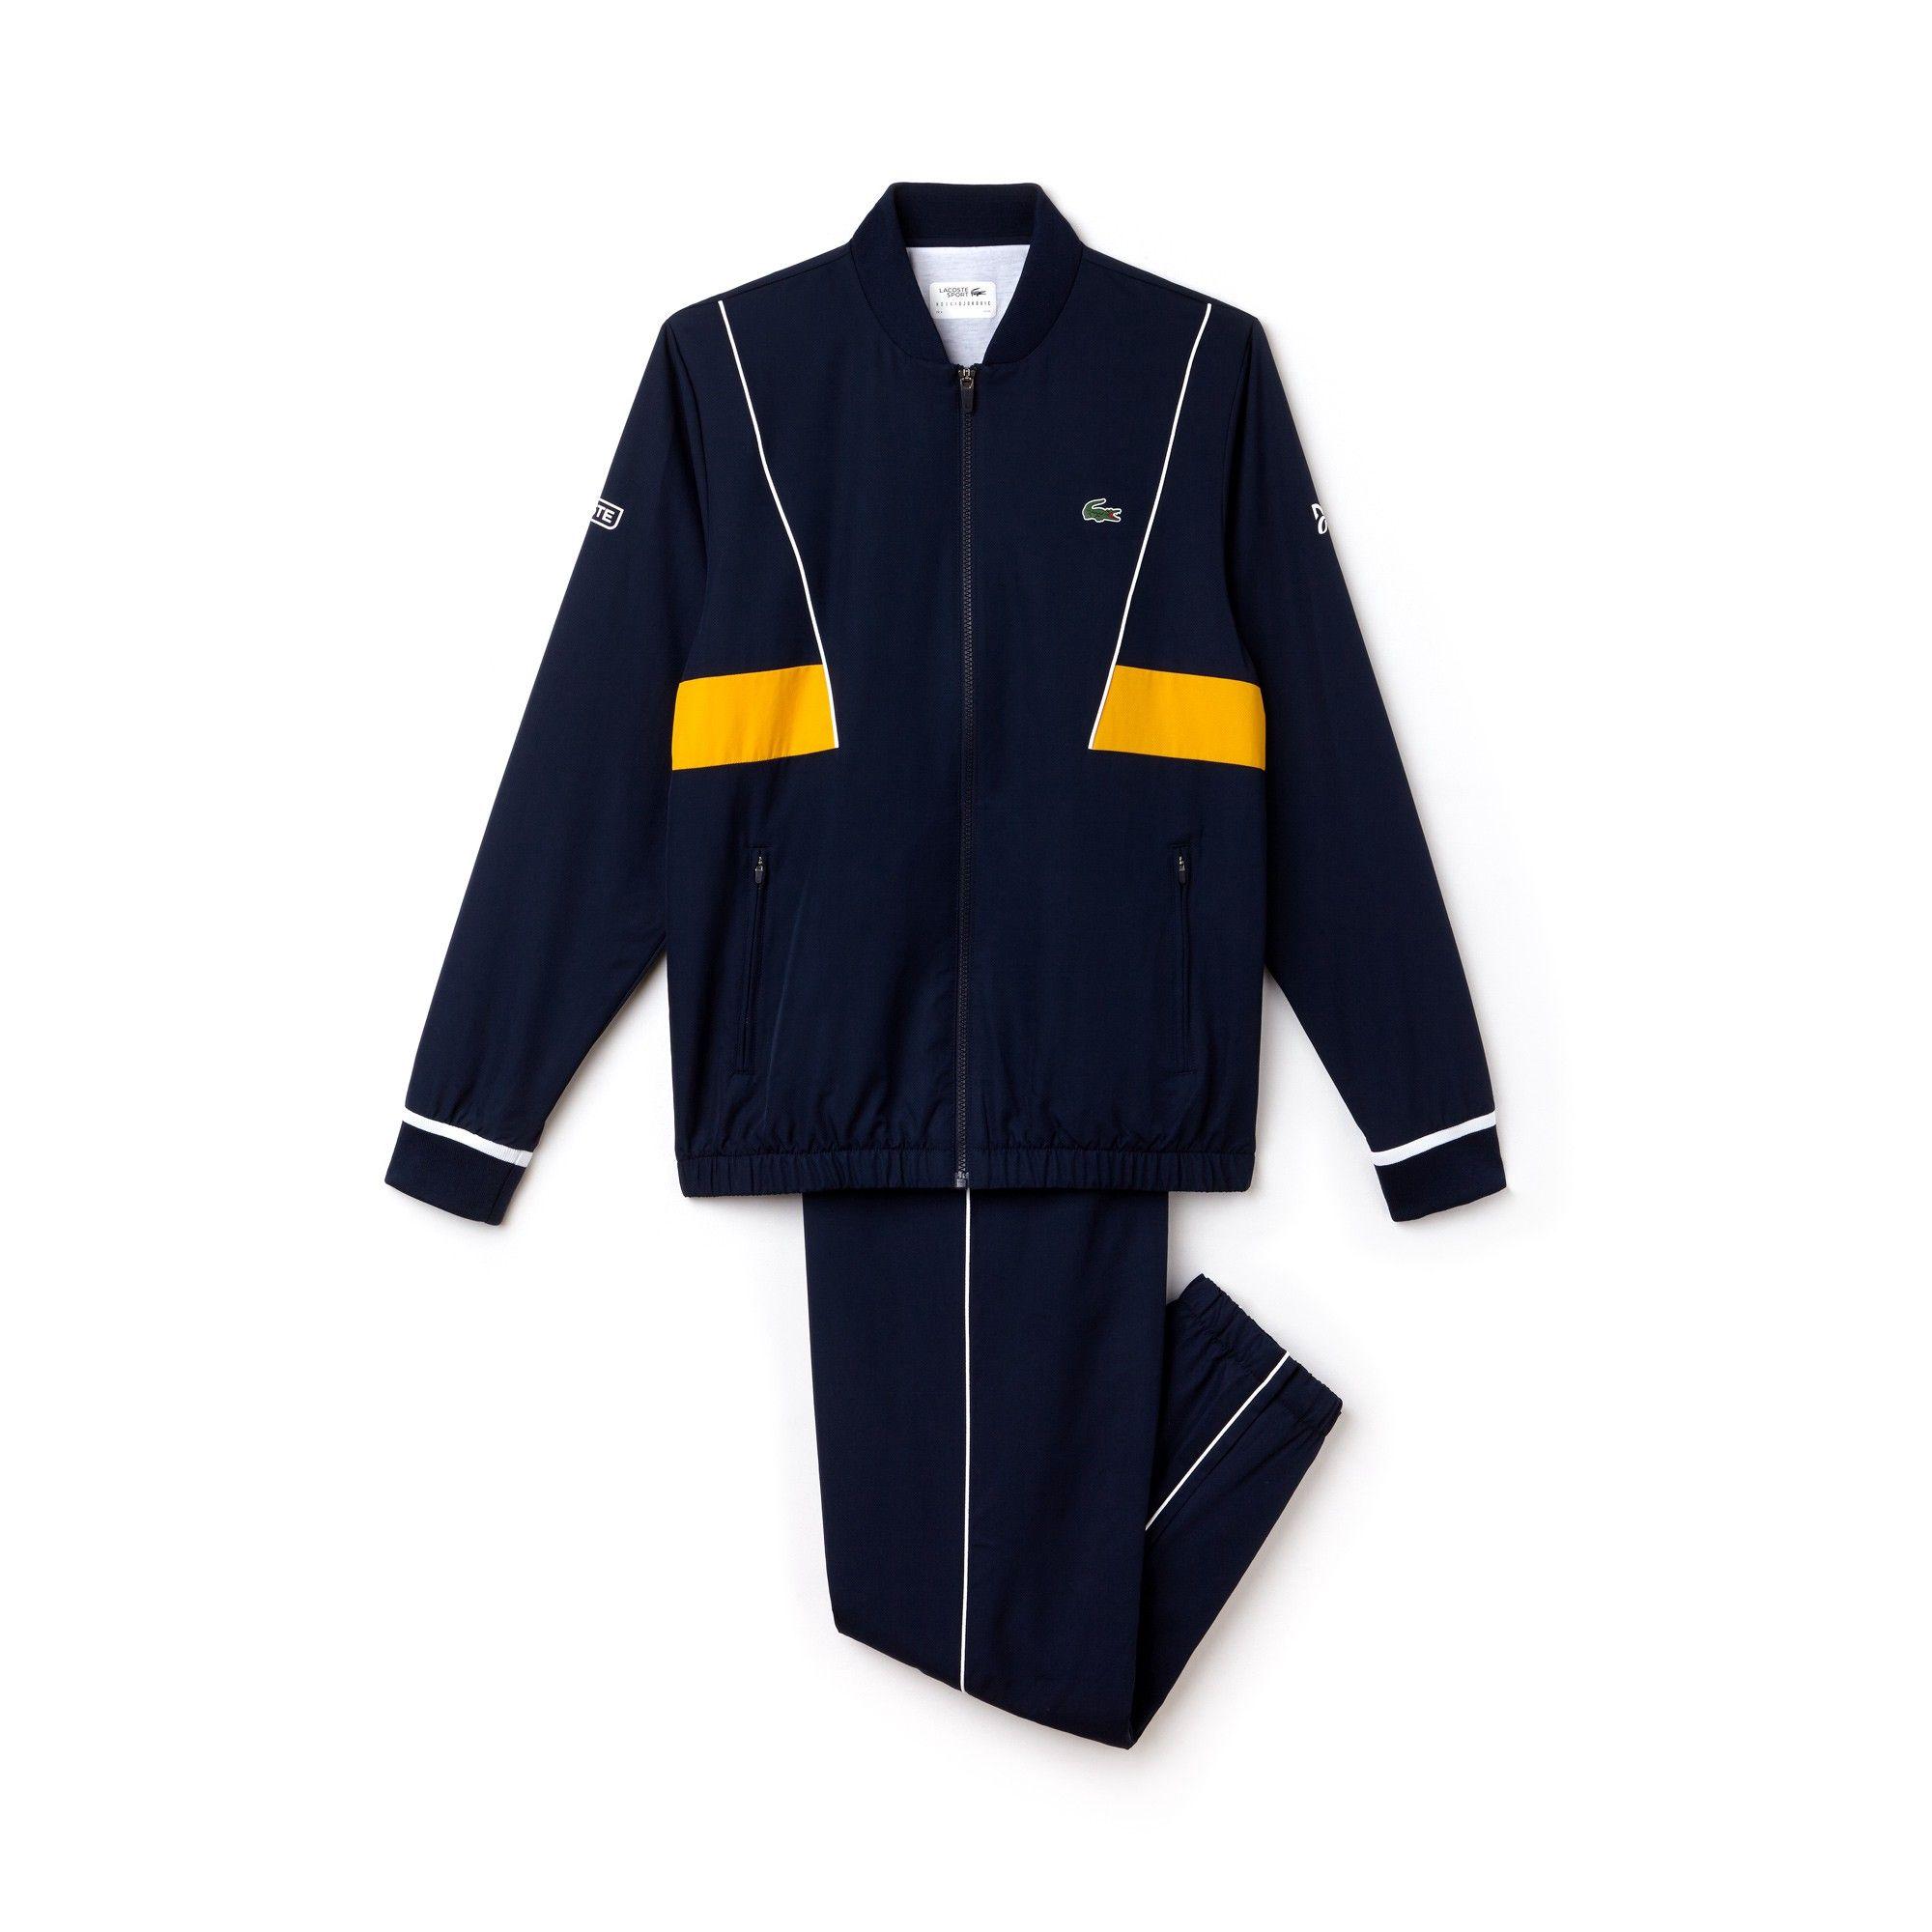 b627197c8 Lacoste Men s Sport Taffeta Tracksuit - Novak Djokovic Collection Navy  Blue White-Buttercup 3XL